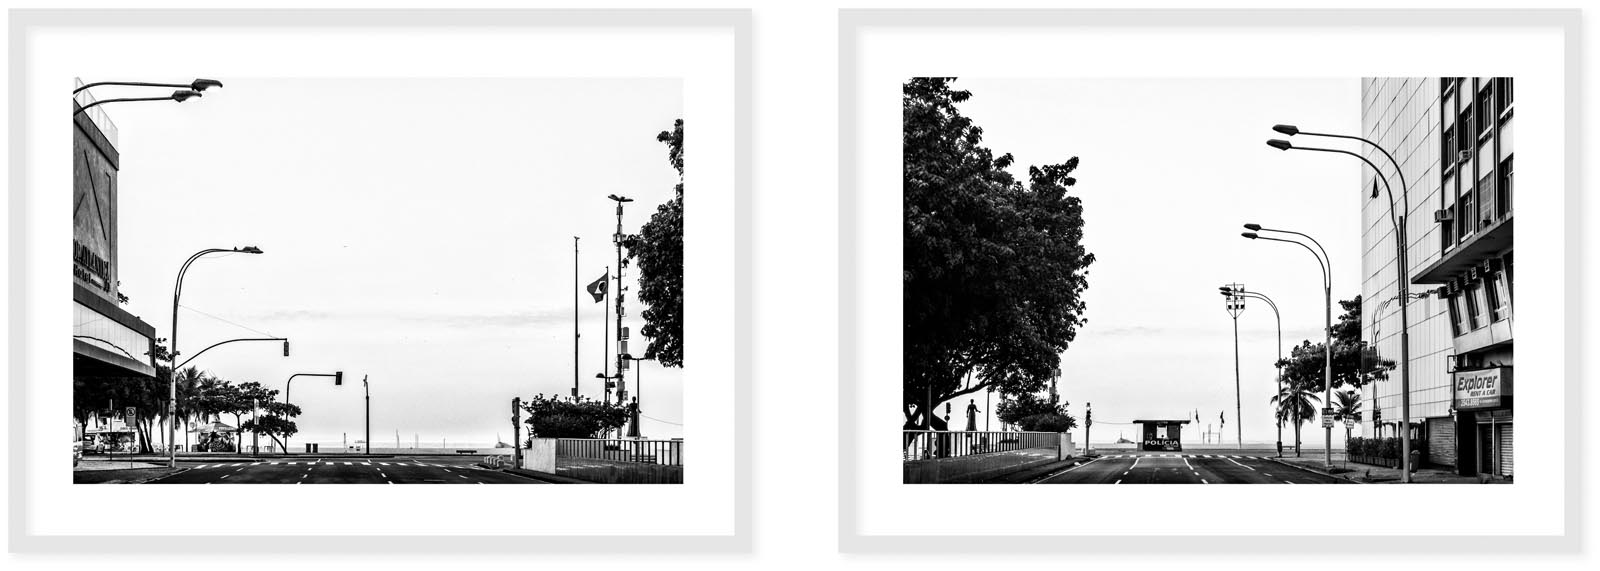 Martin Ogolter: Avenida Princesa Isabel